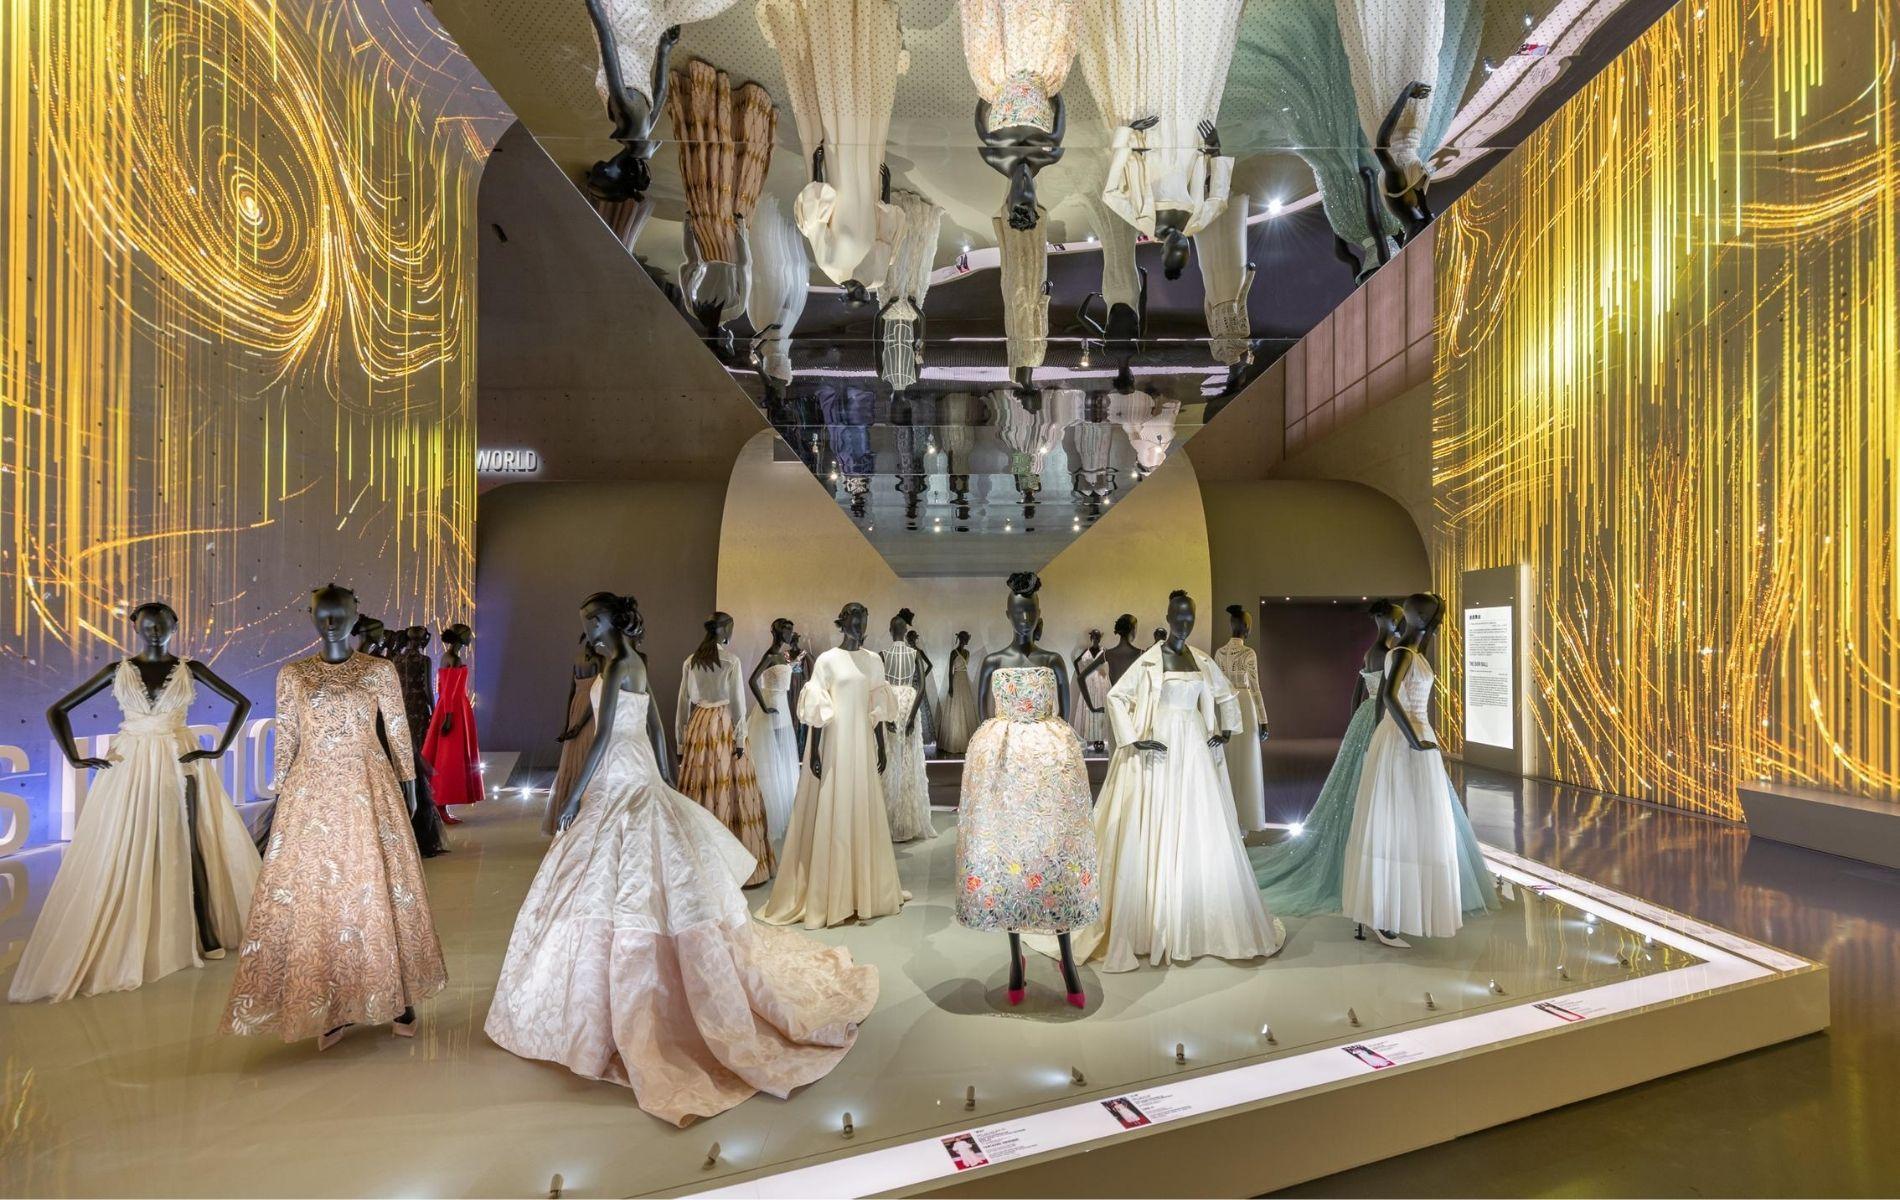 Inside the Christian Dior: Designer of Dreams exhibition